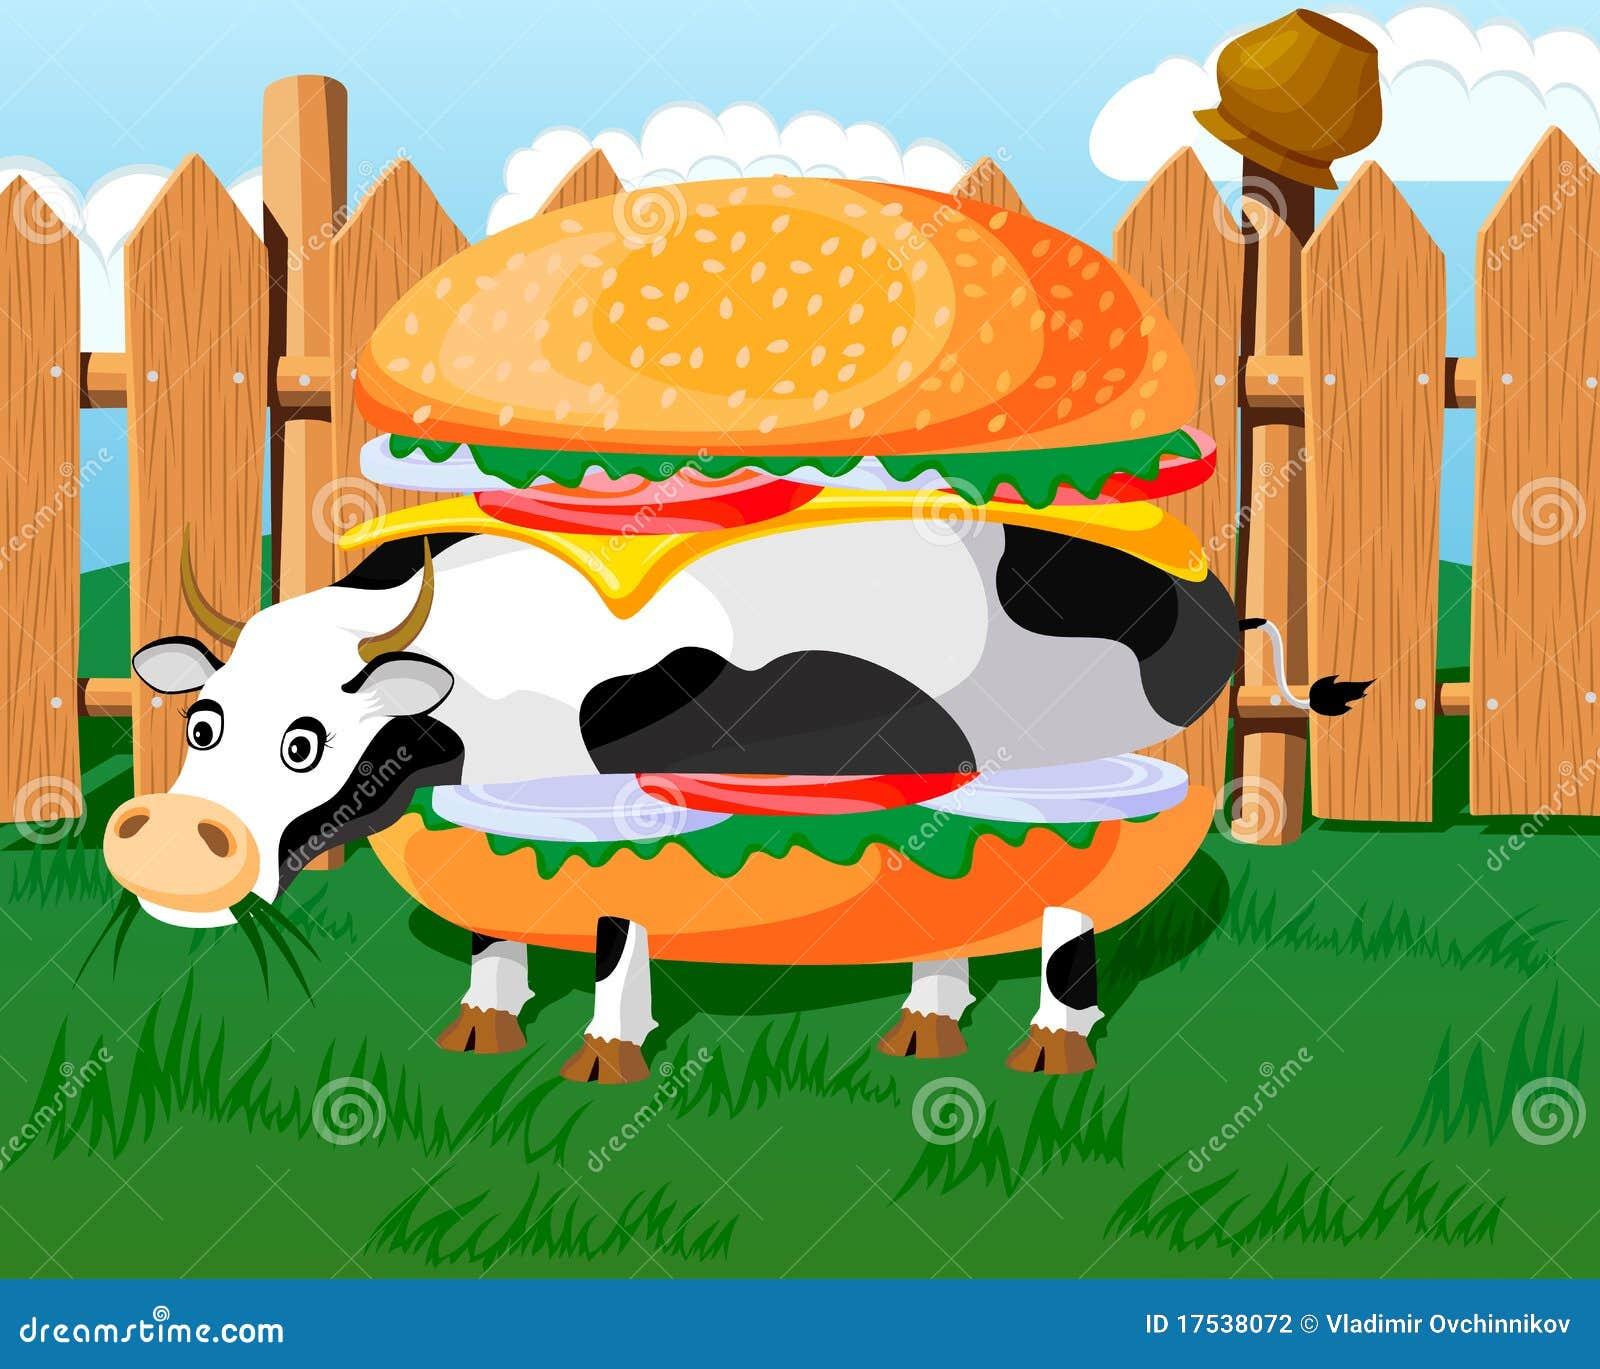 hamburger stock photography image